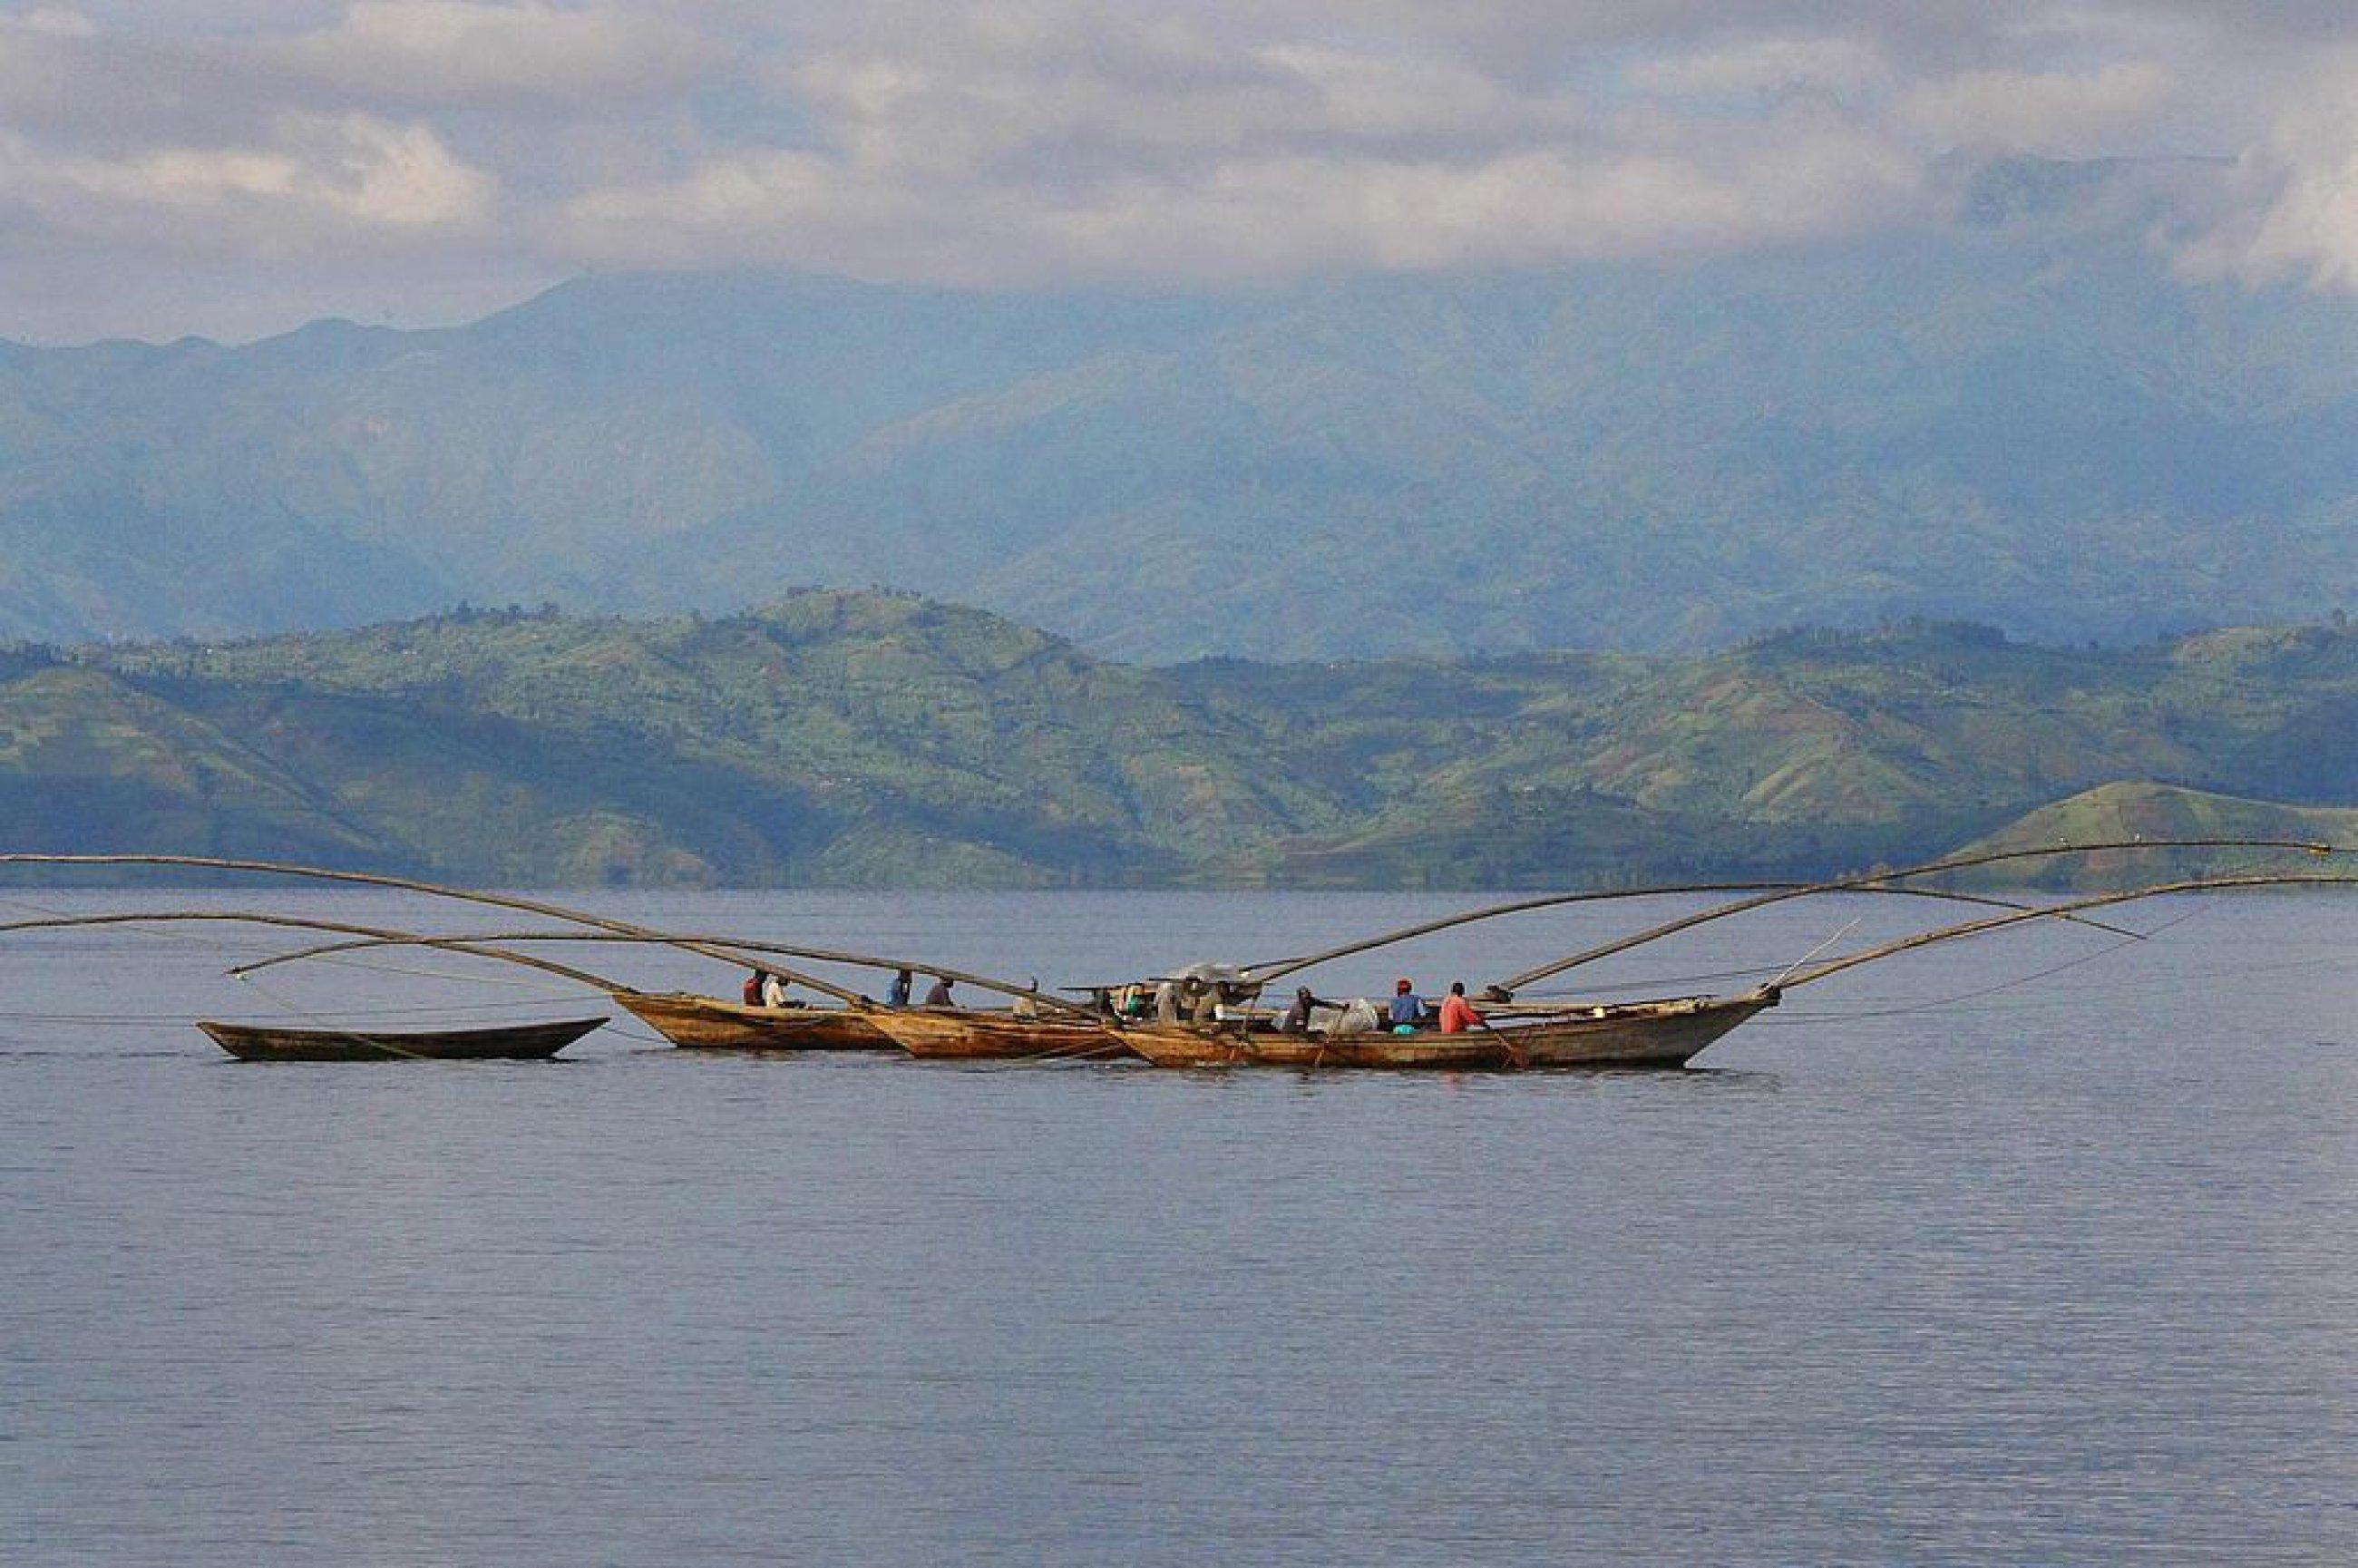 https://bubo.sk/uploads/galleries/4986/1024px-lake-kivu-boats.jpg